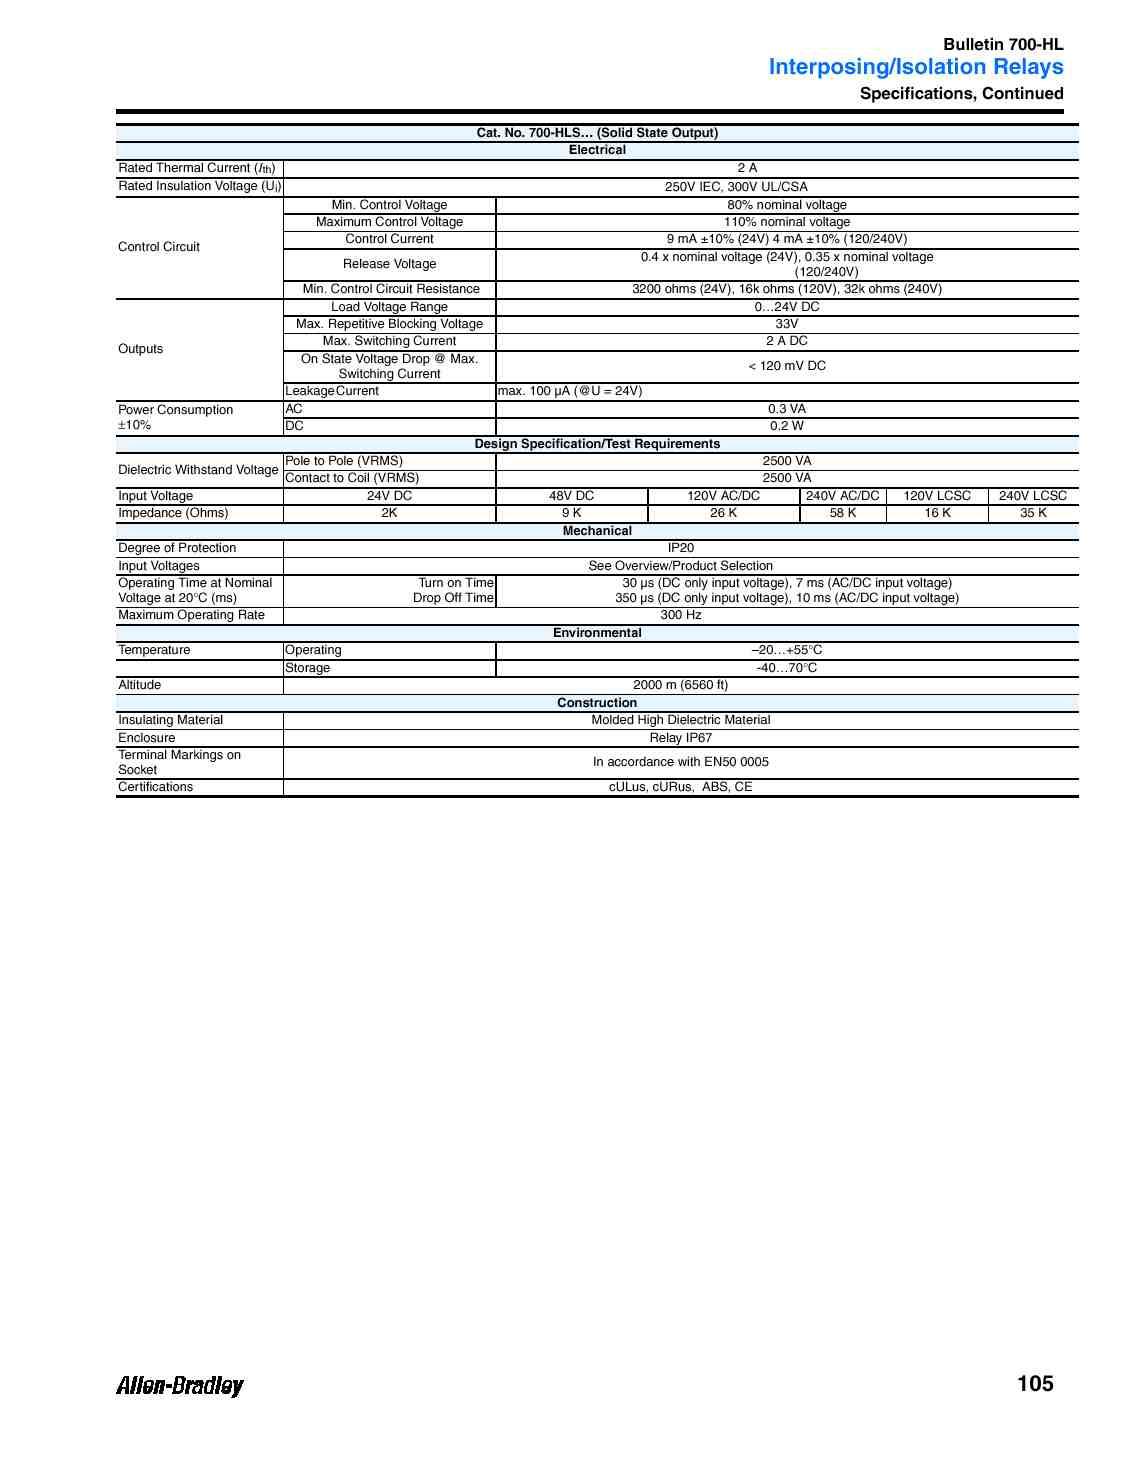 A-B 700-HLT1U1-EX TERMINAL BLOCK RELAY HAZ LOCATION CERT on